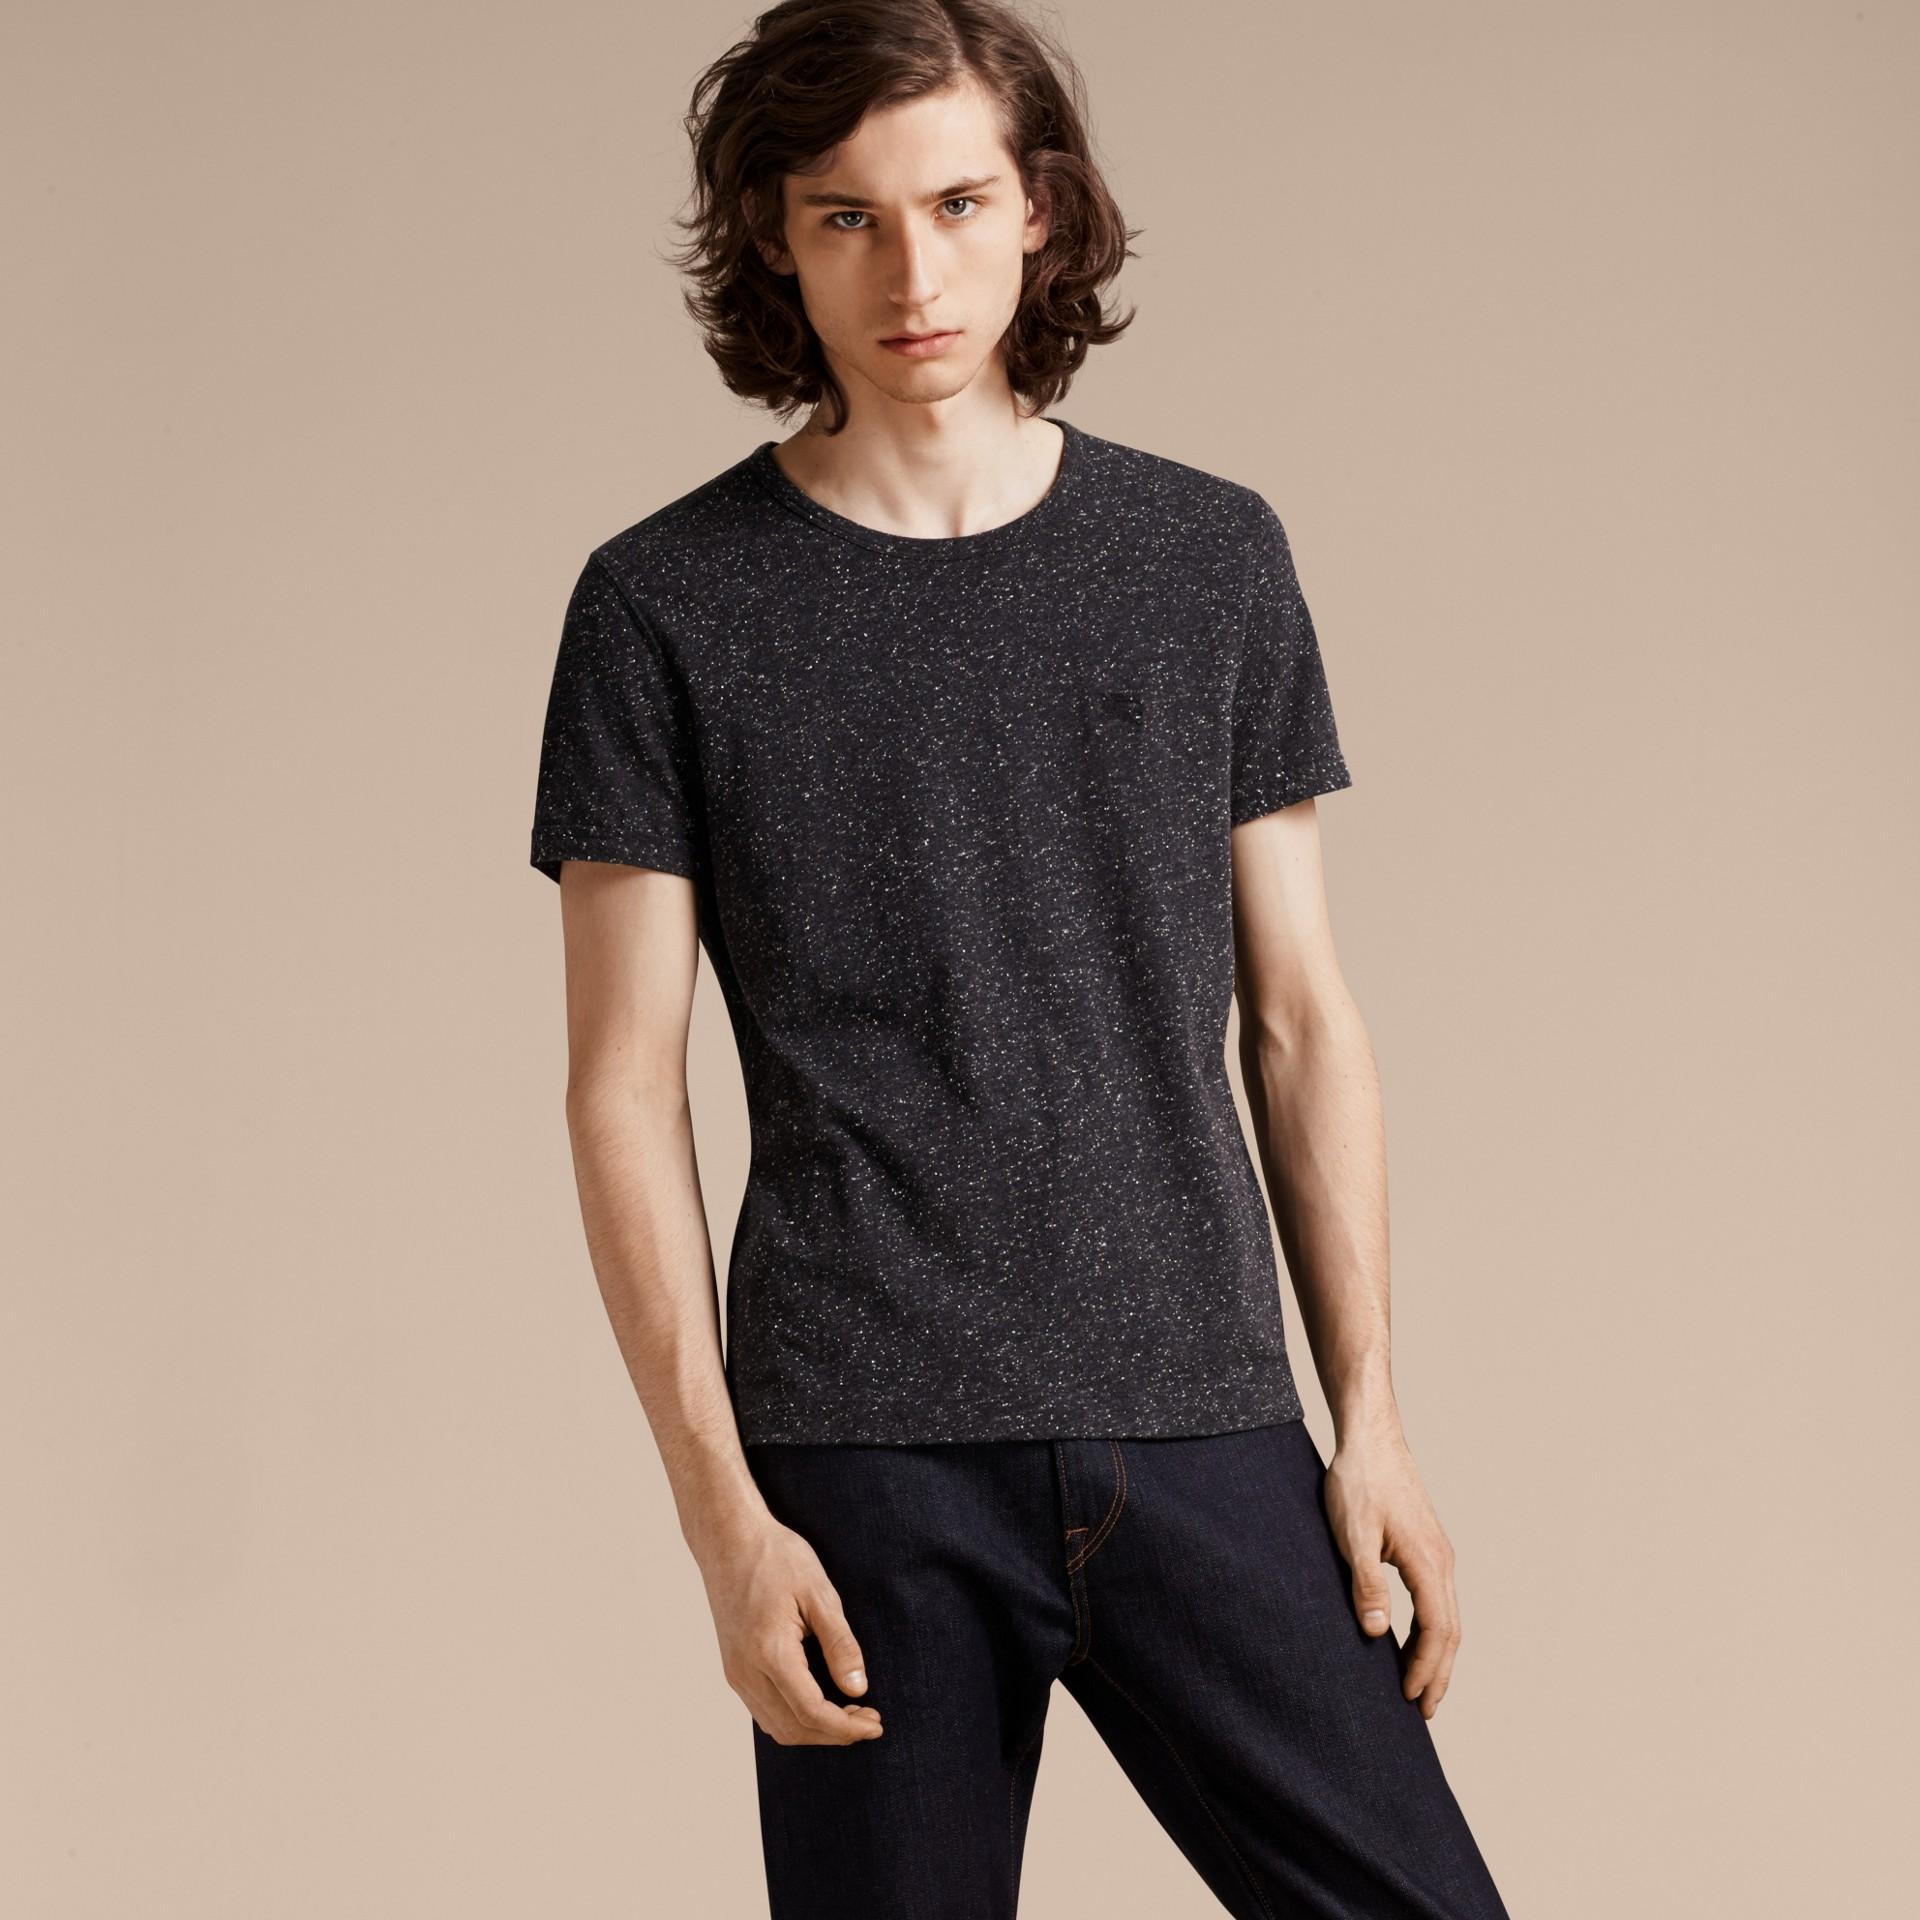 Black Crew Neck Flecked Cotton Jersey T-Shirt Black - gallery image 6